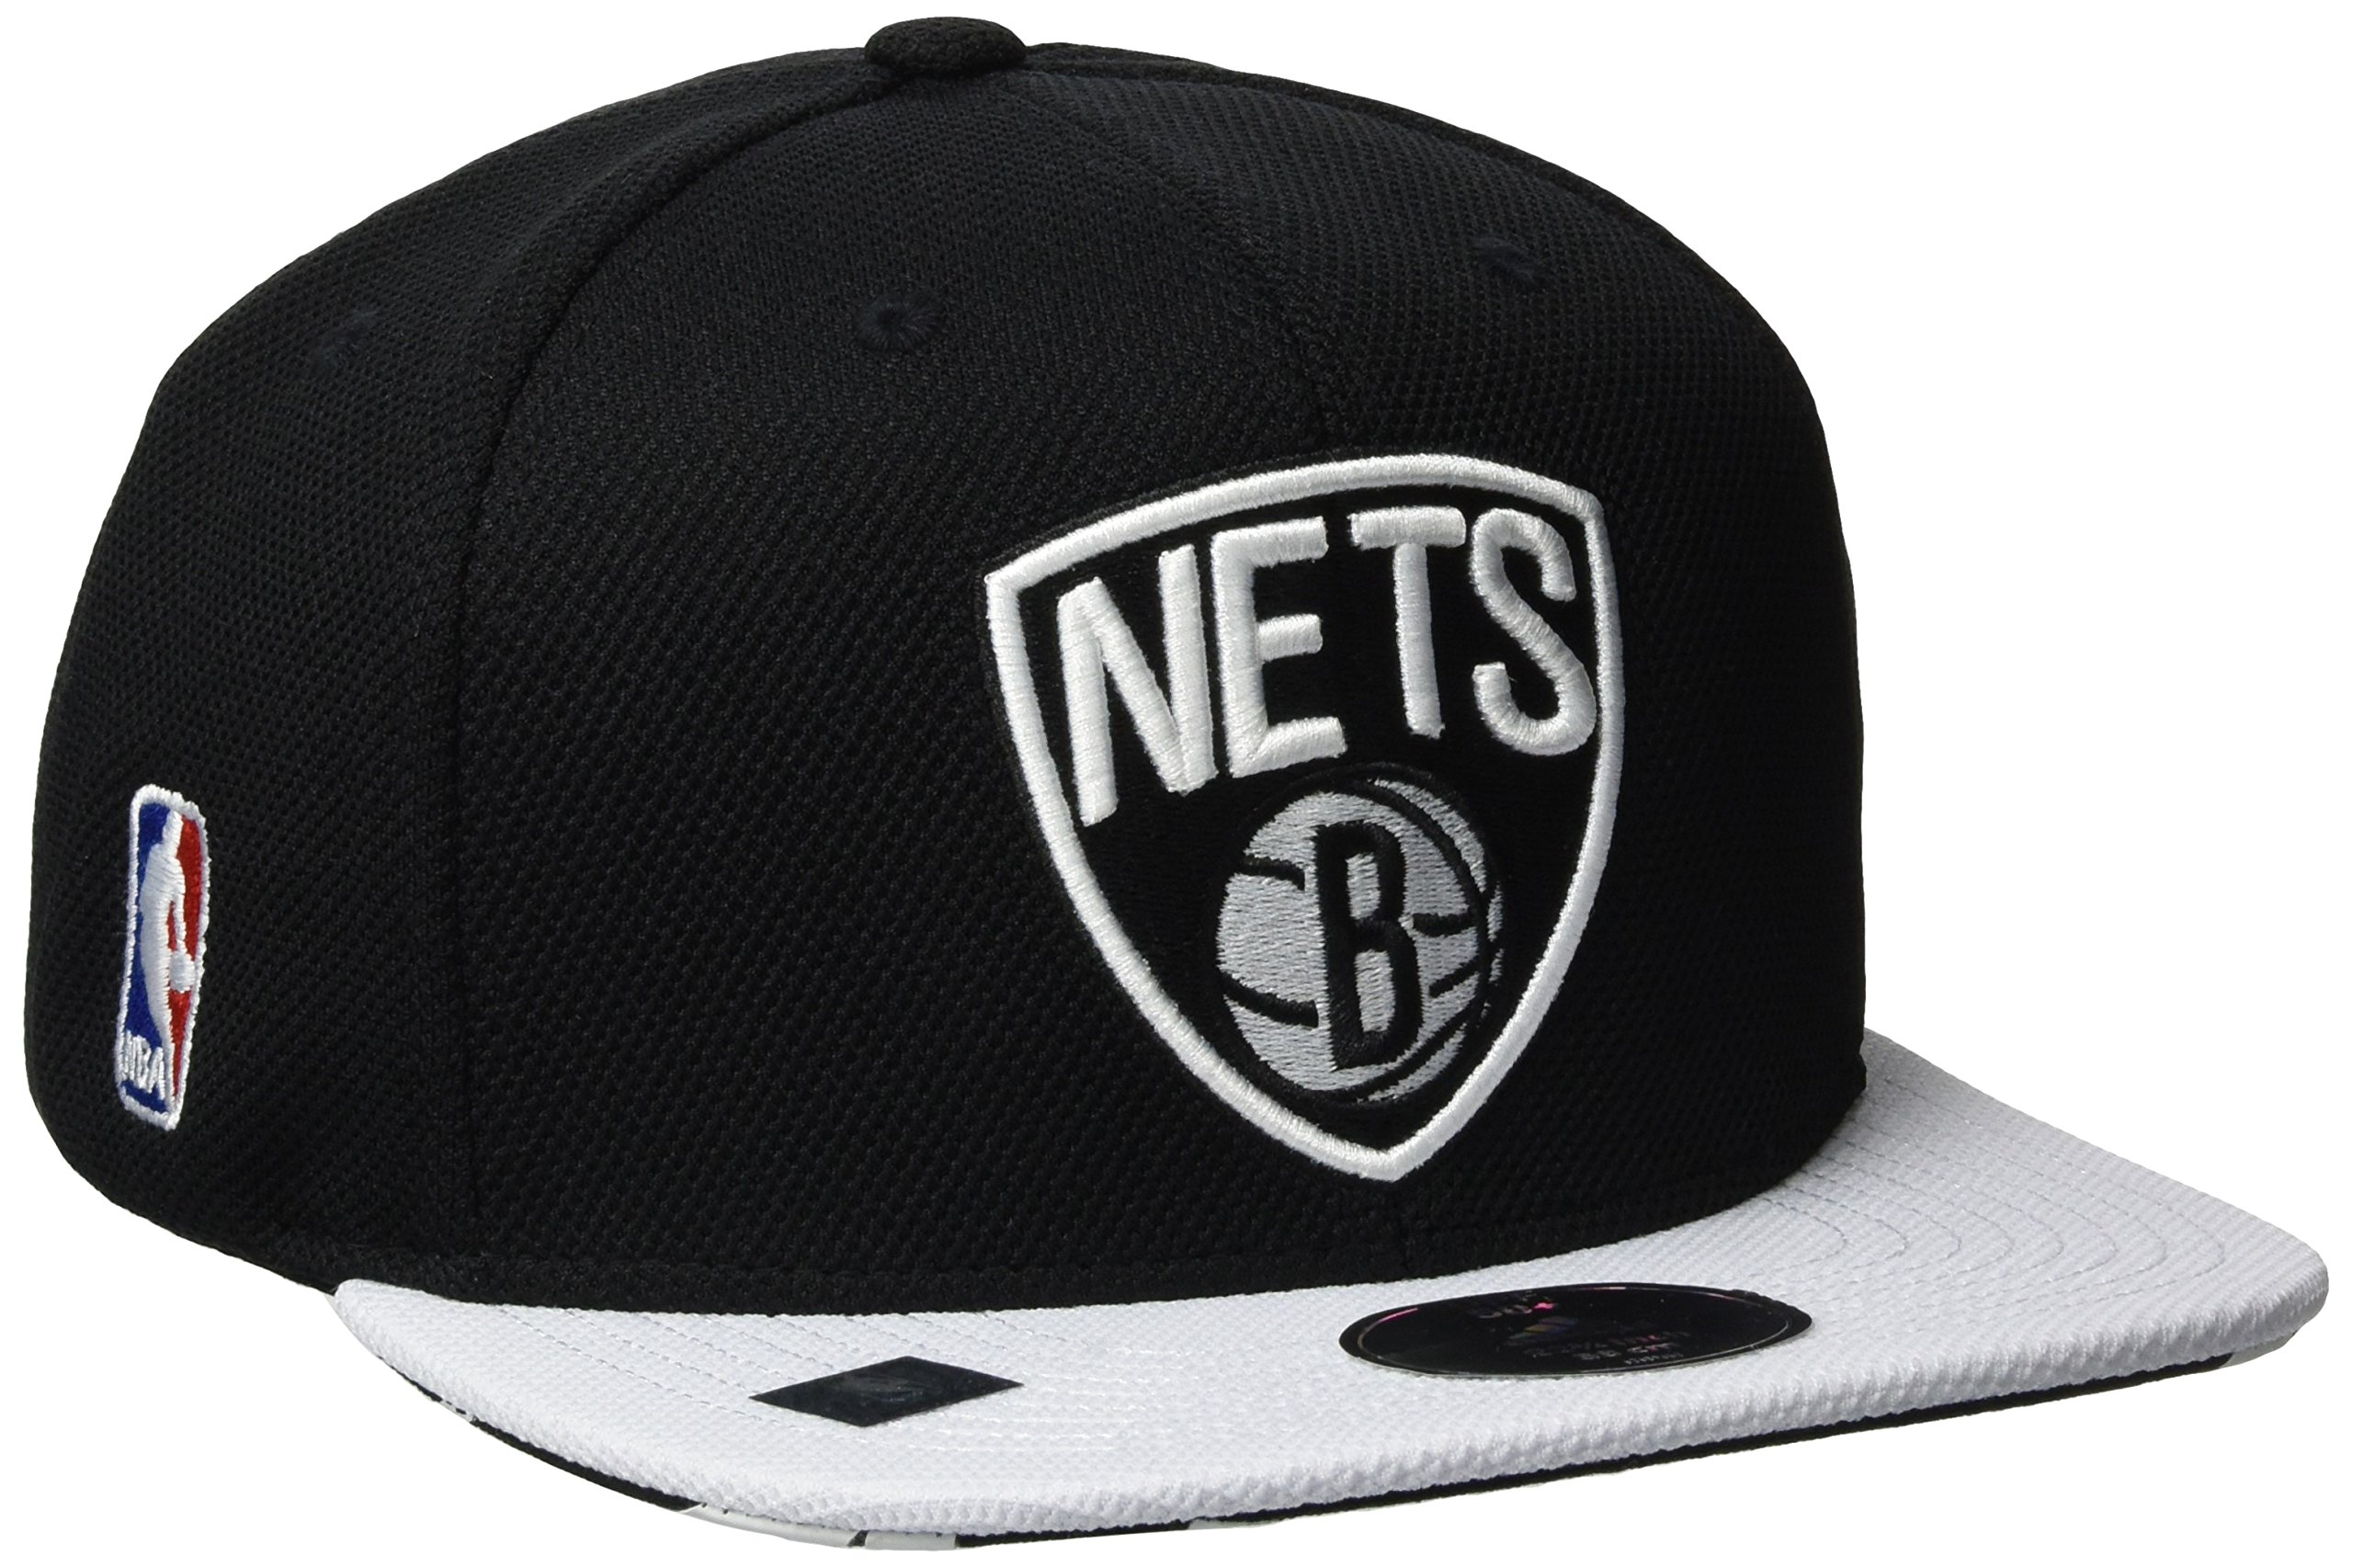 adidas Flat Cap Nets - Gorra unisex, color negro / blanco